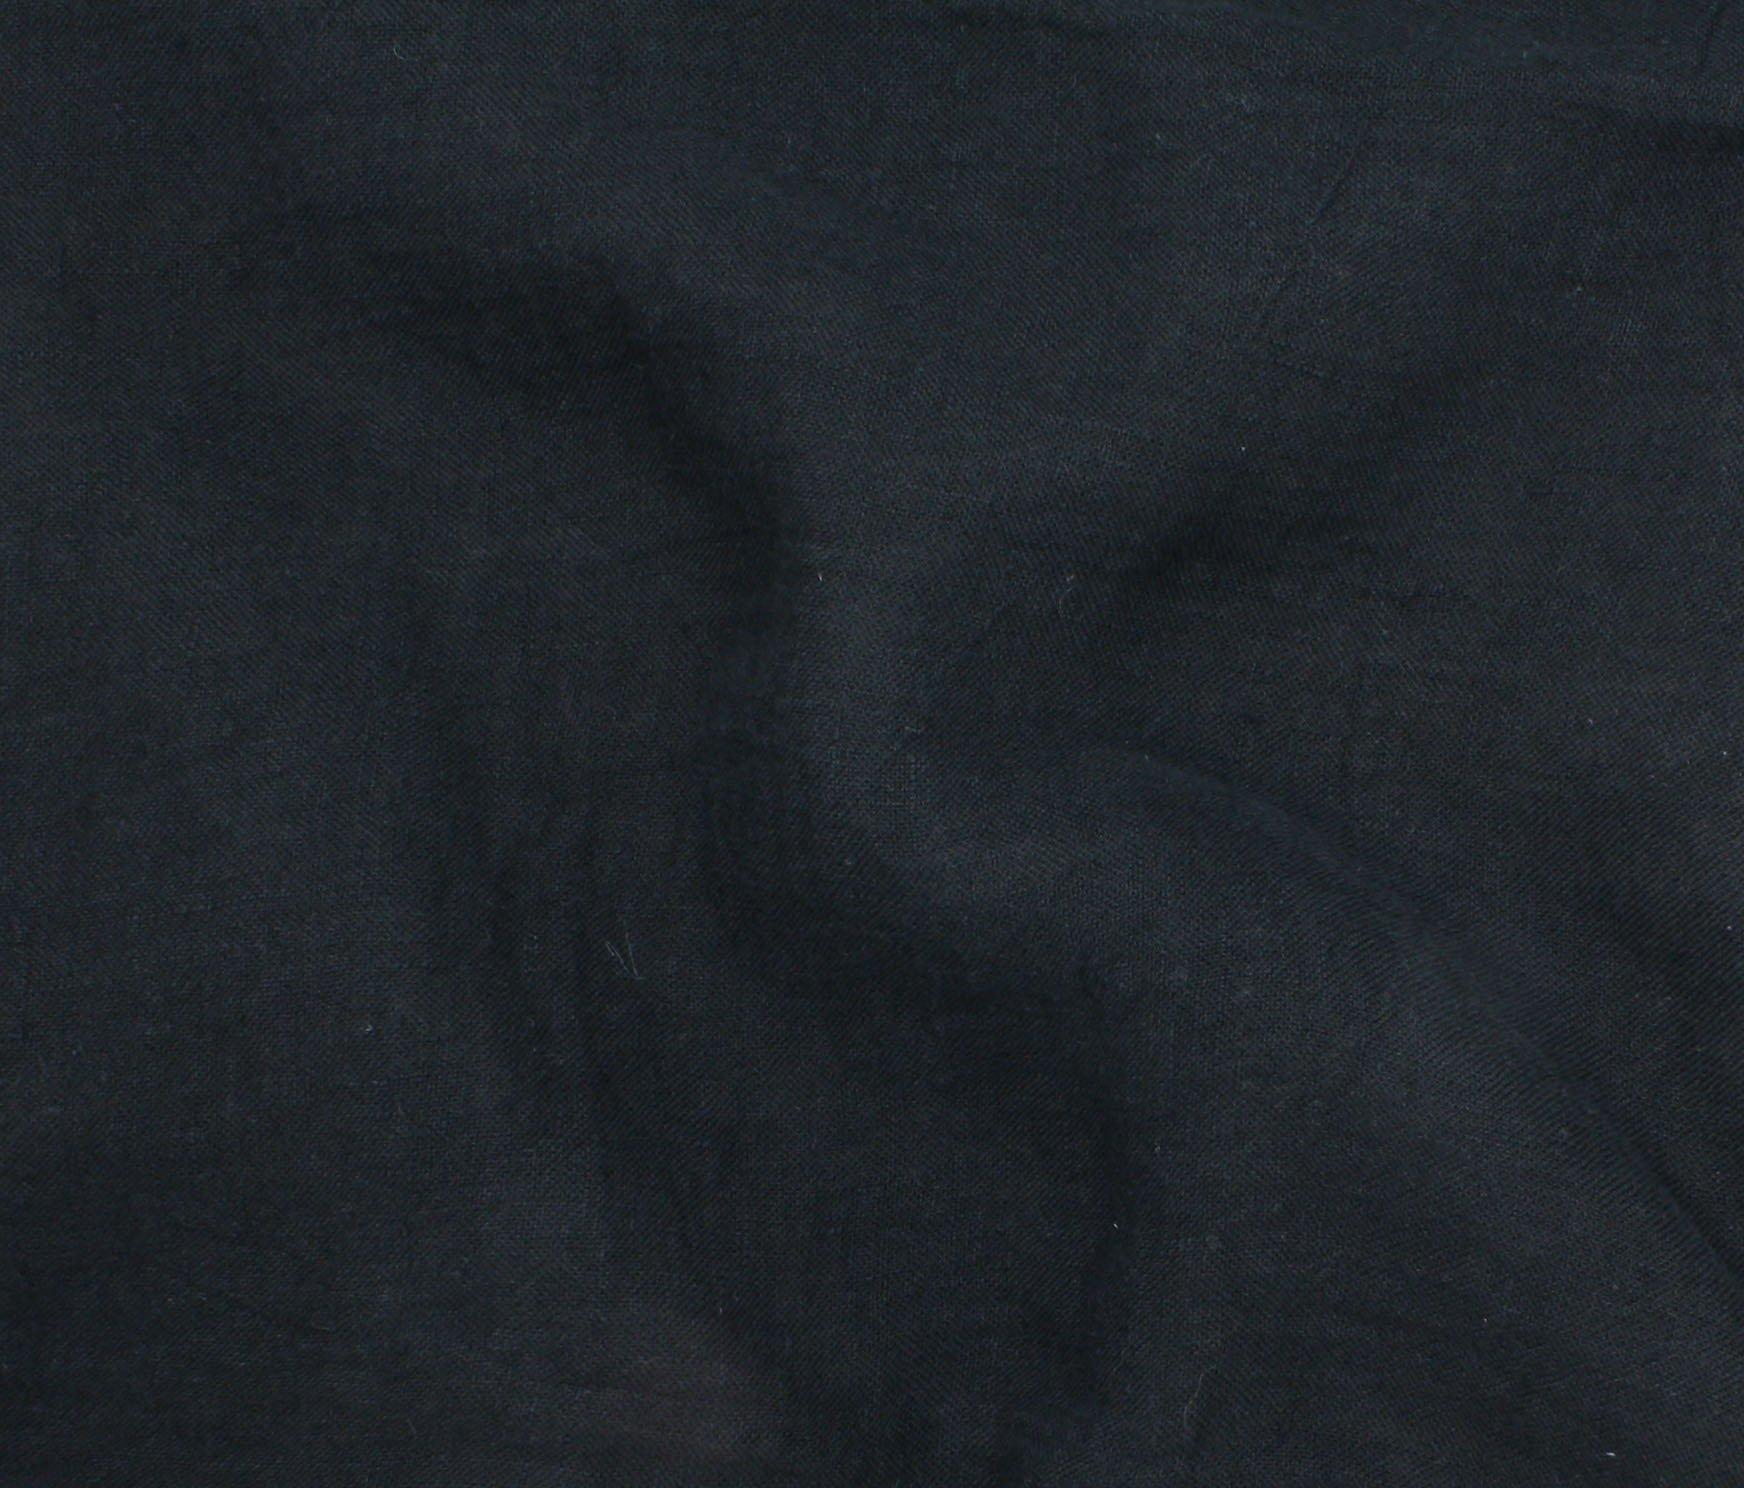 Mozart Linen - Black